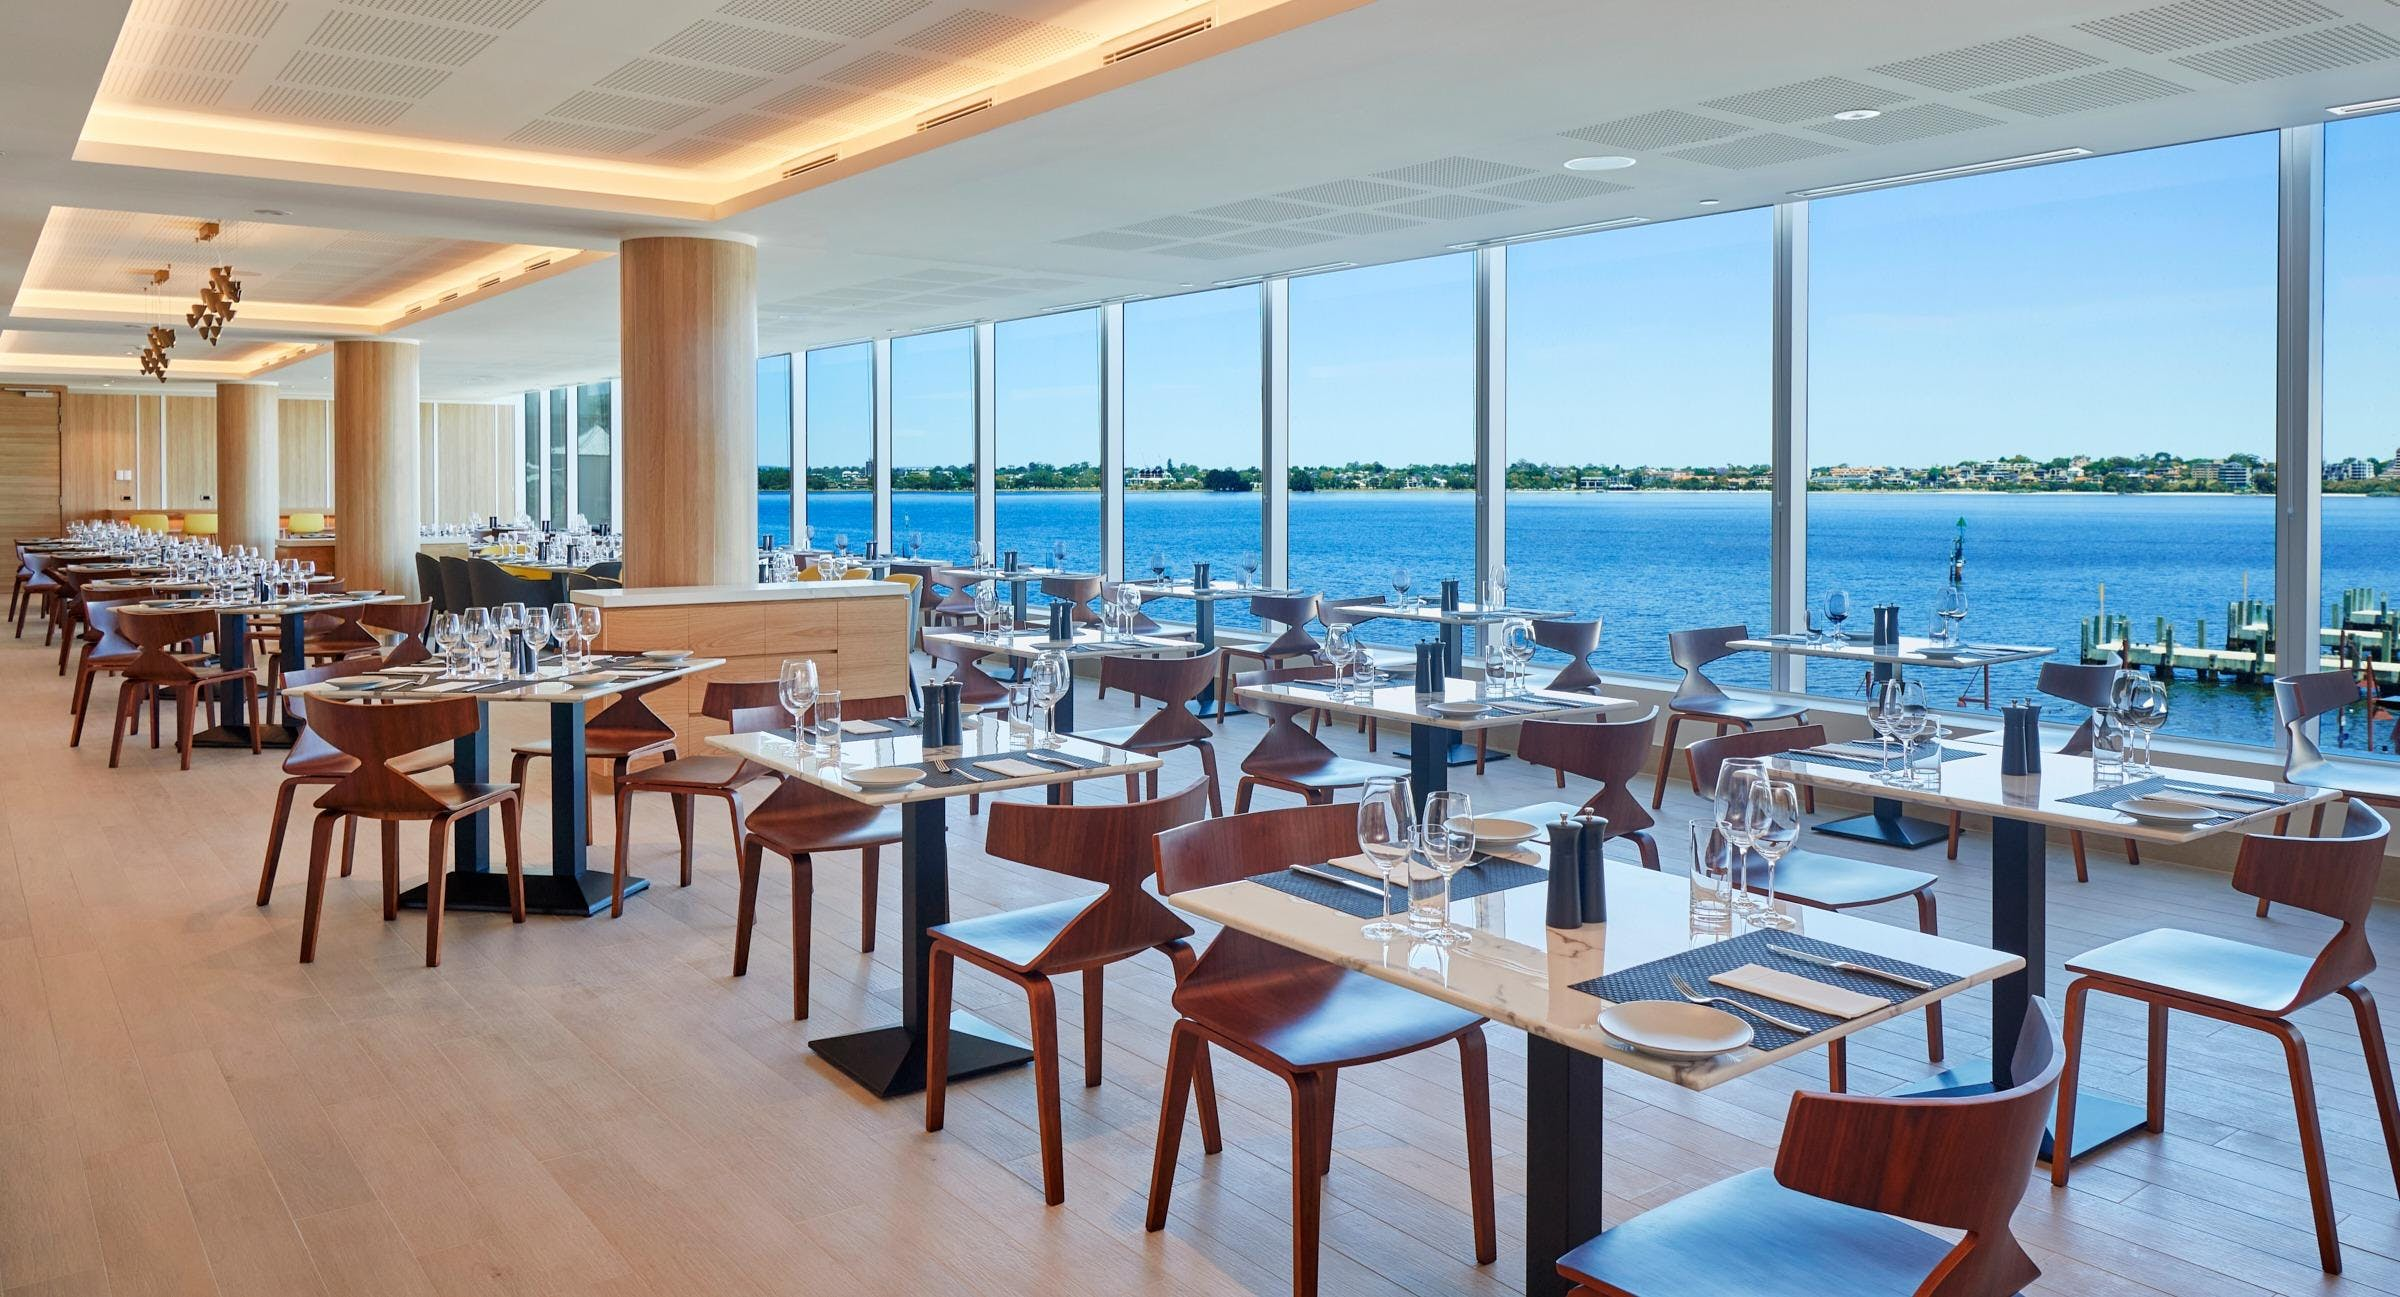 Photo of restaurant Reel Kitchen in Perth CBD, Perth